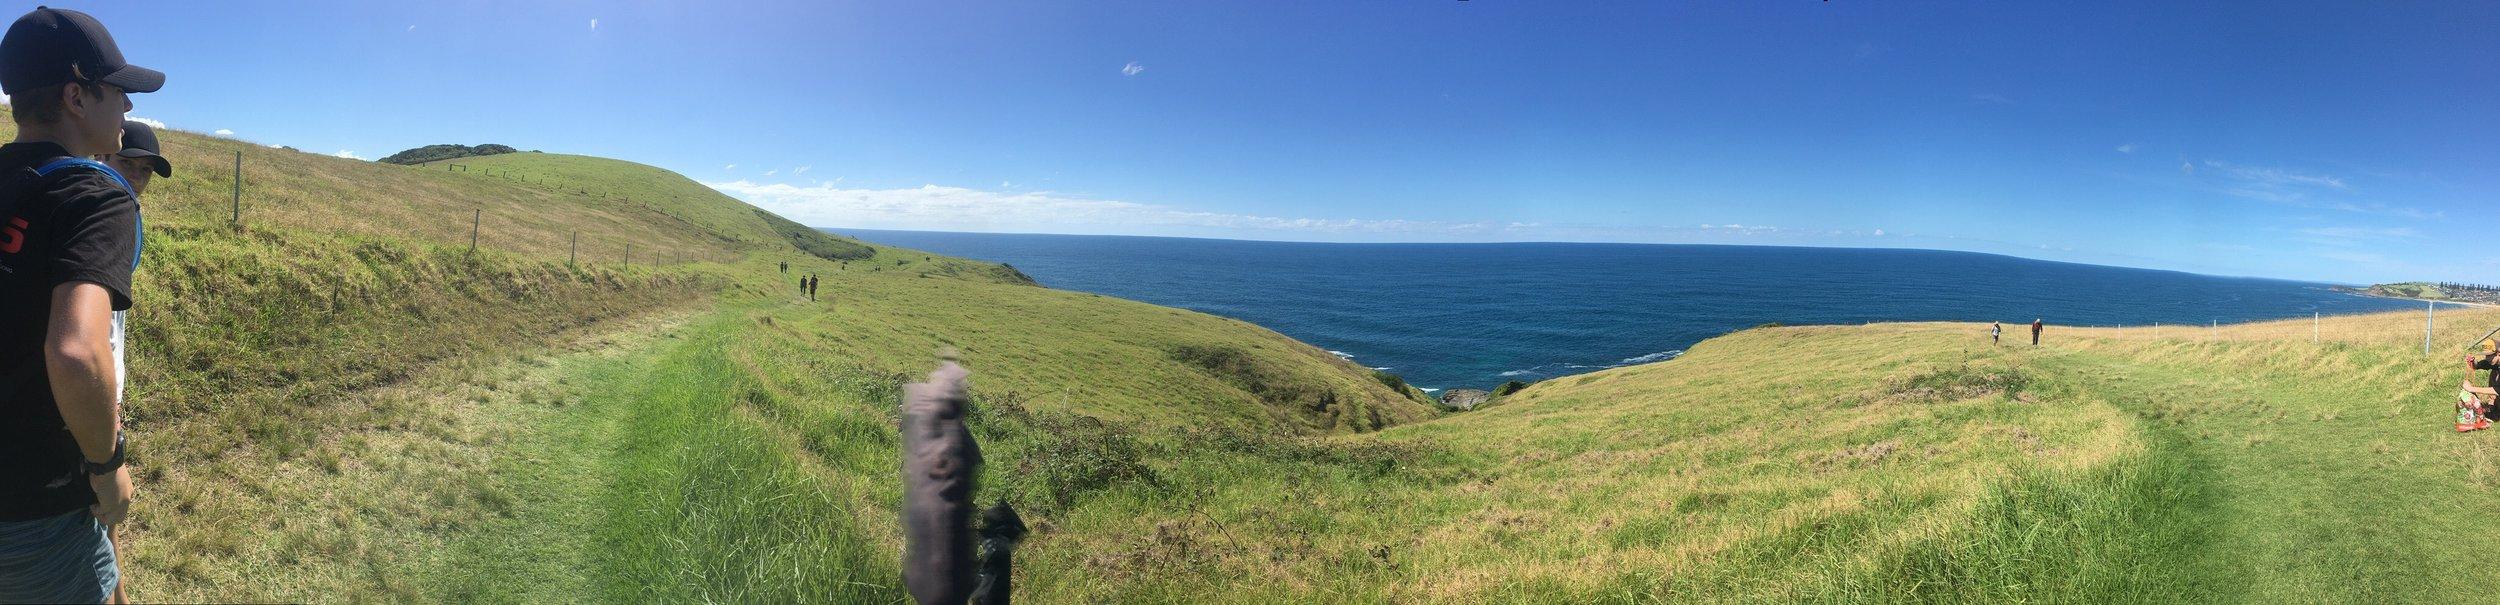 Coastal track hike-2 (1).jpeg